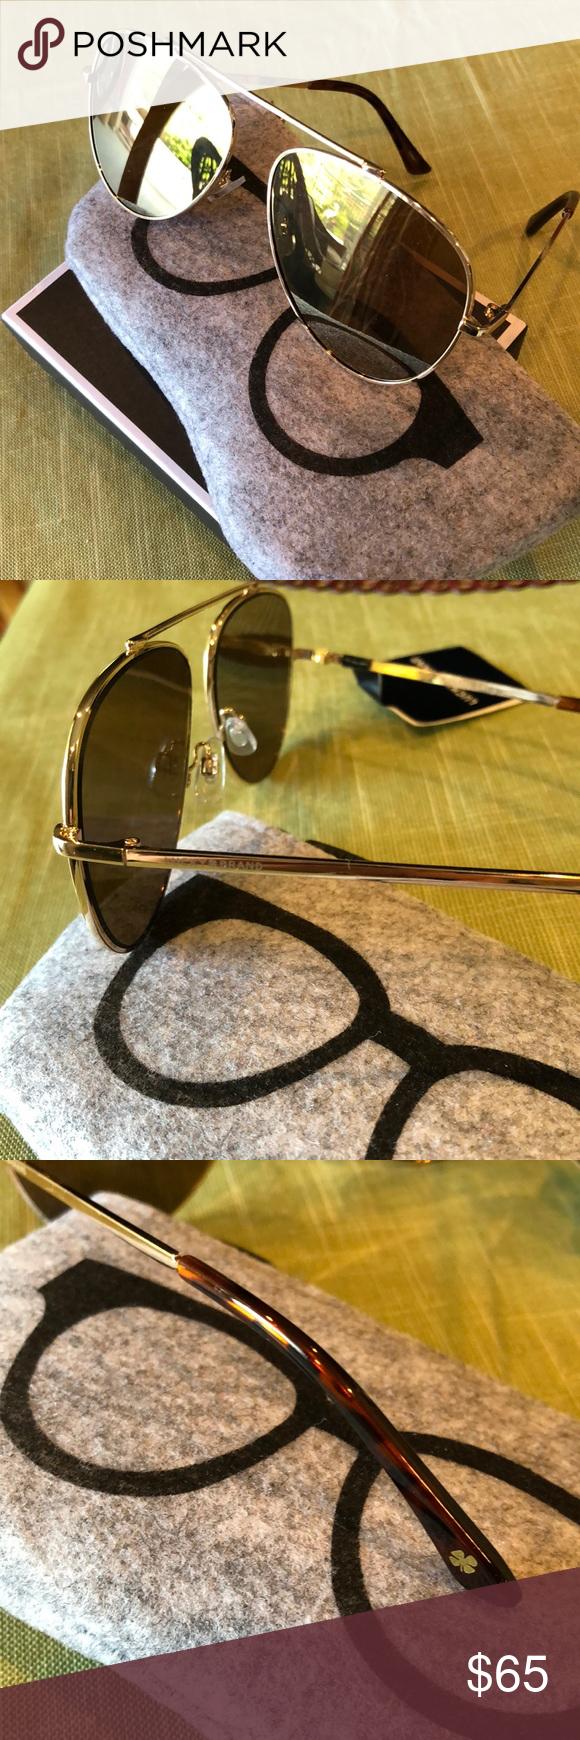 e2bce3b255 Lucky Brand Capitola Cat3 Sunglasses New Beautiful Lucky Brand Capitola  Sunglasses by Rem